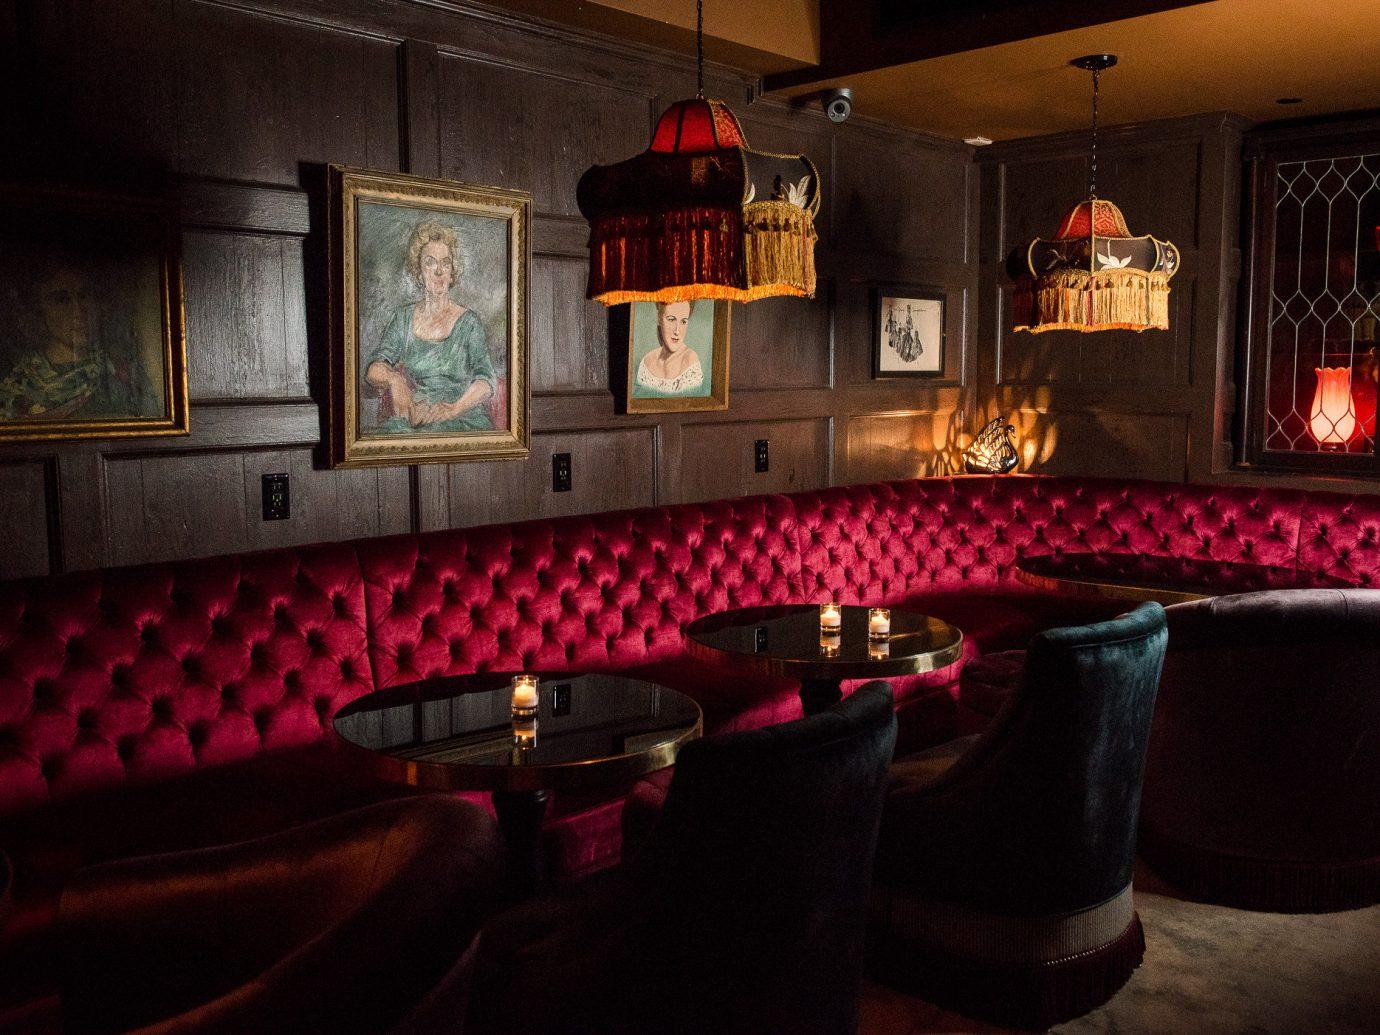 NYC Trip Ideas indoor Bar interior design room Entertainment restaurant pub table tavern café